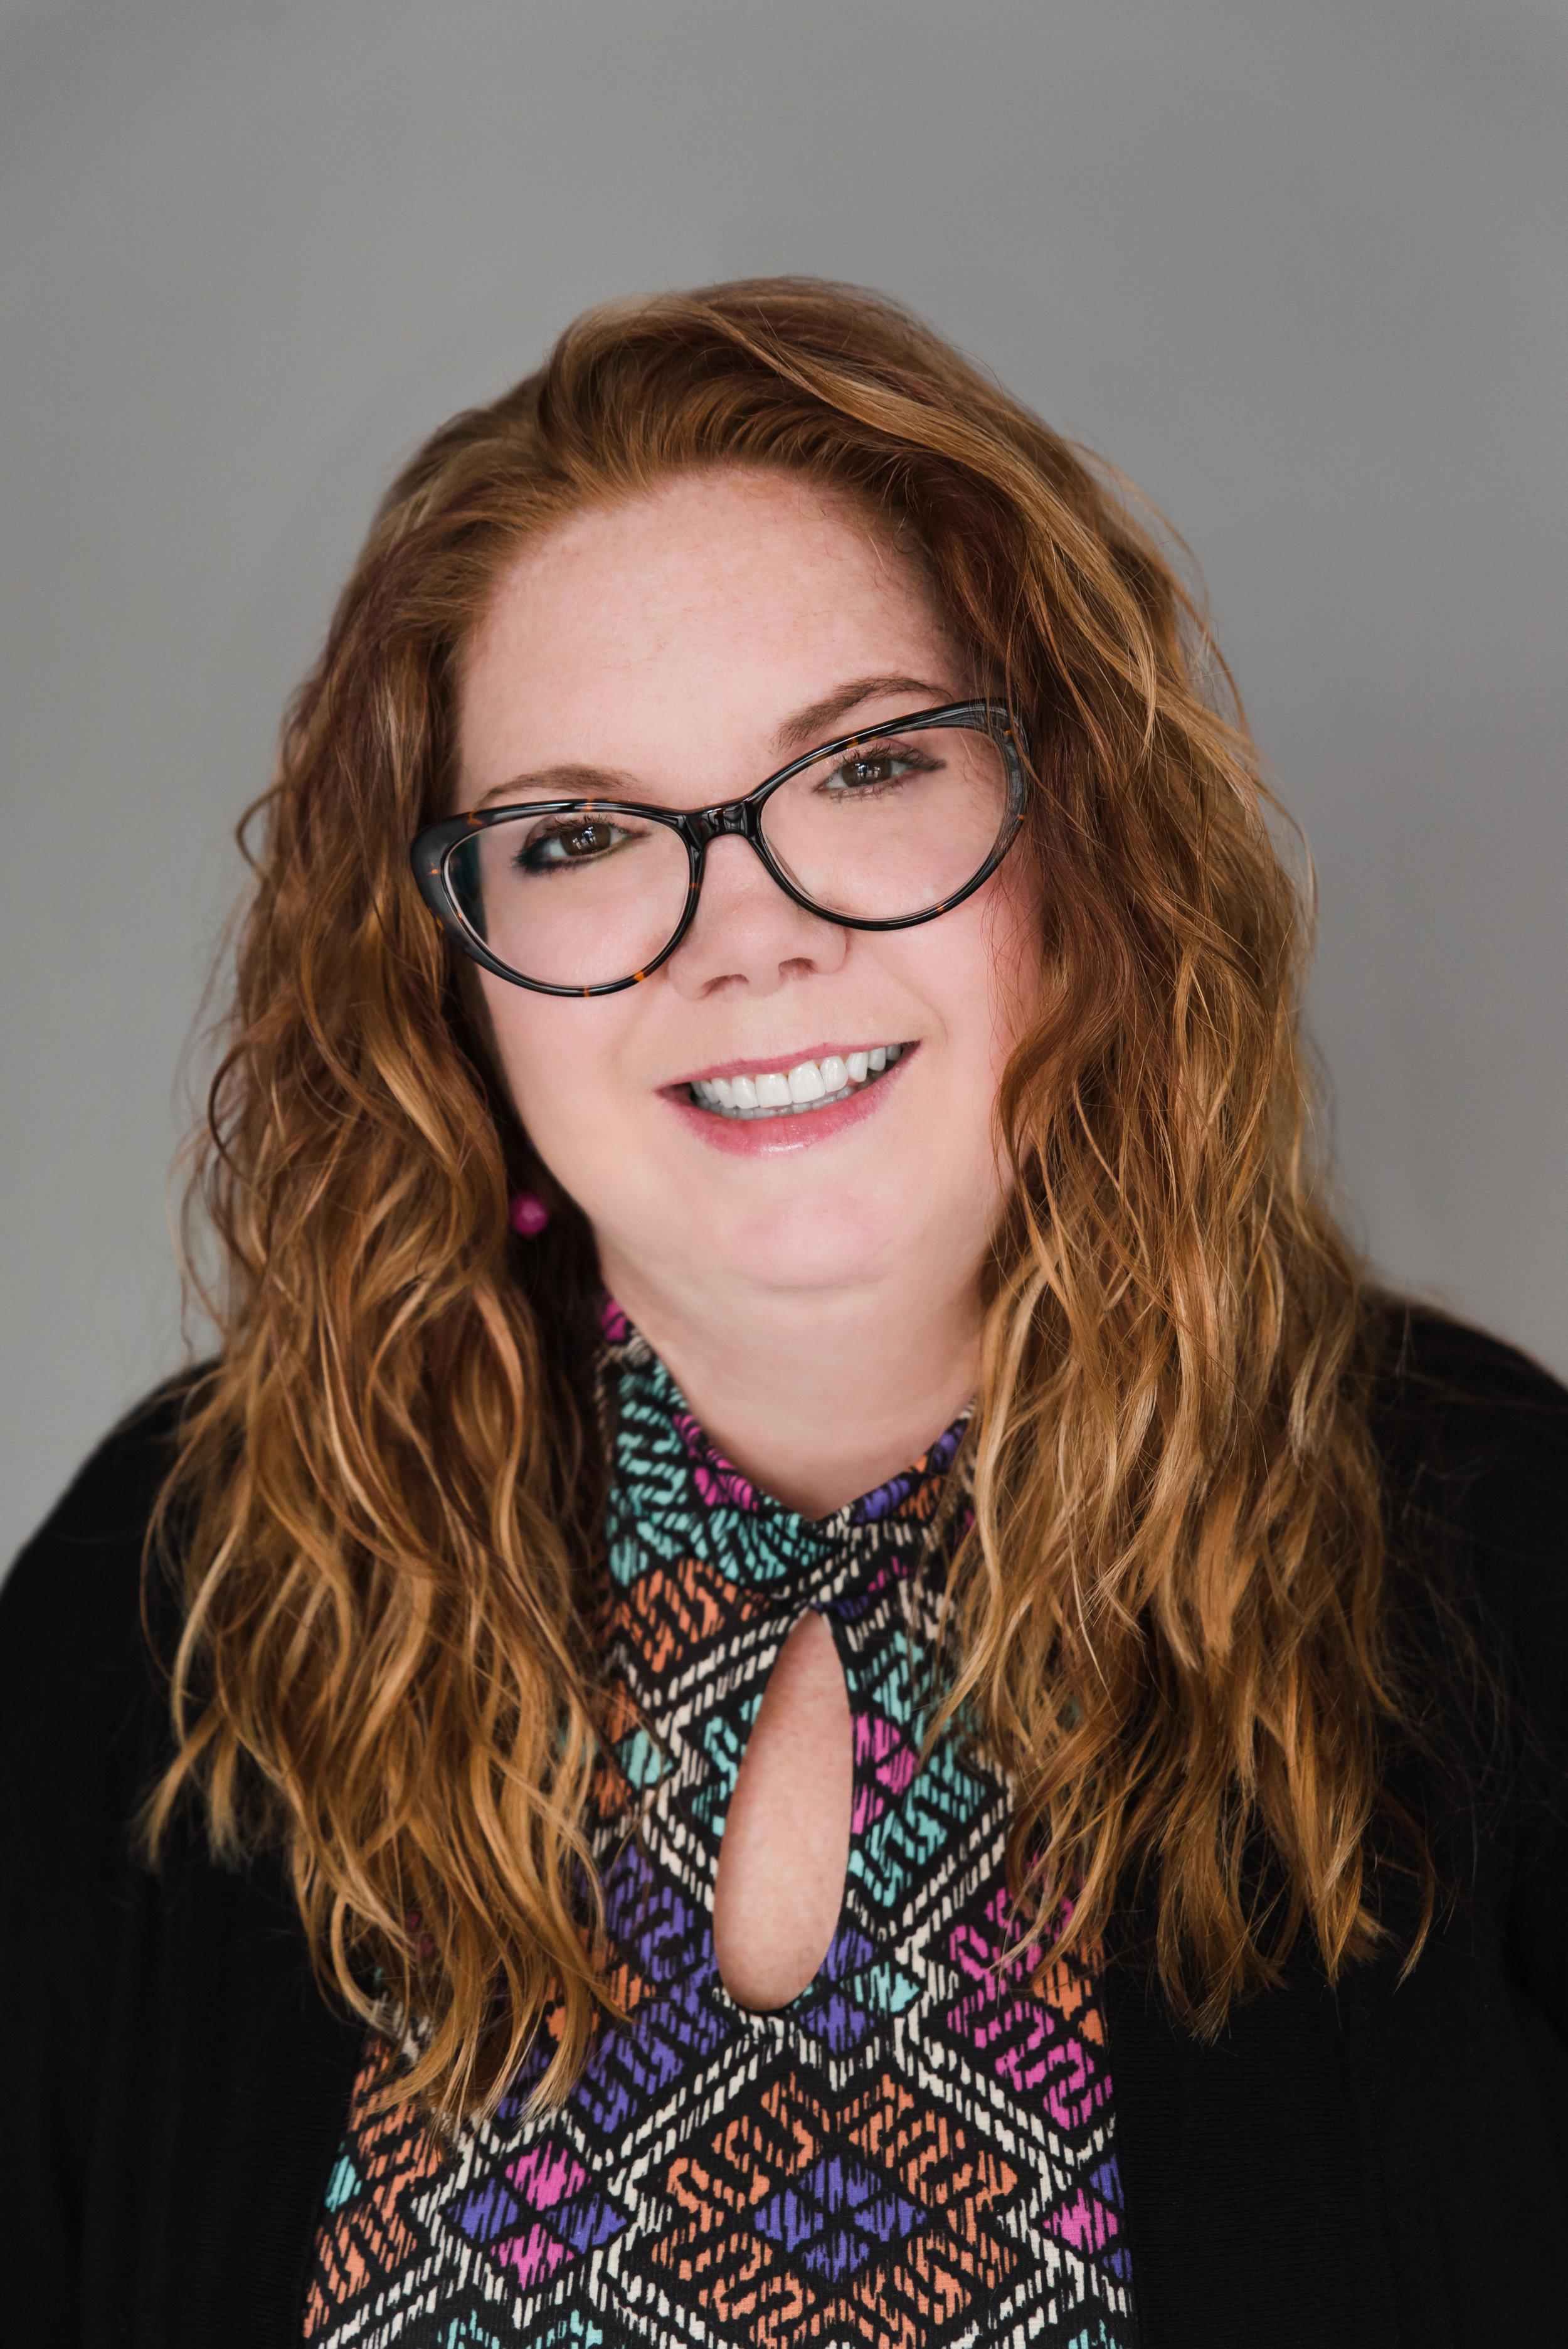 Austin and Round Rock Texas Professional Headshots-Emily Ingalls Photography